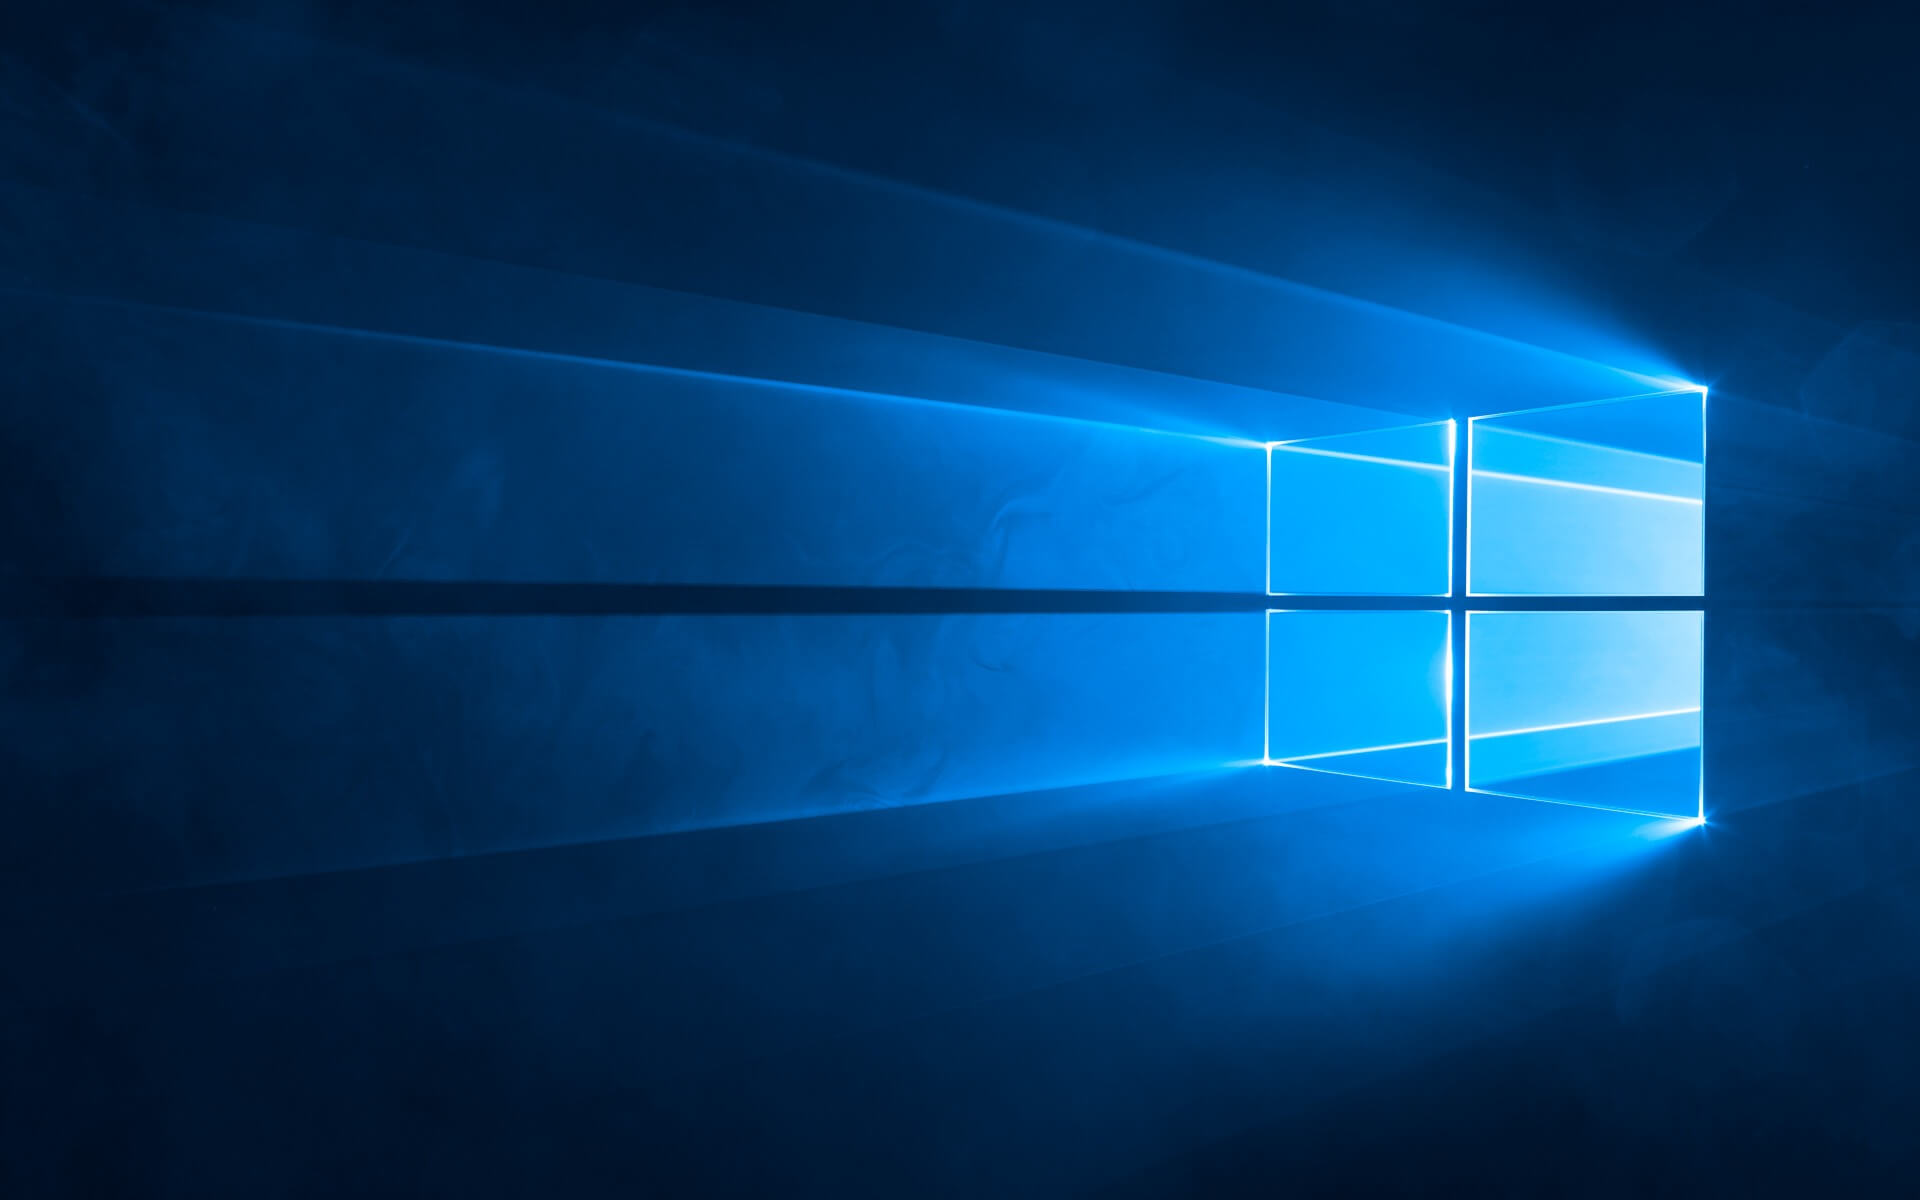 Windows 10: Wallpaper aus Build 10159